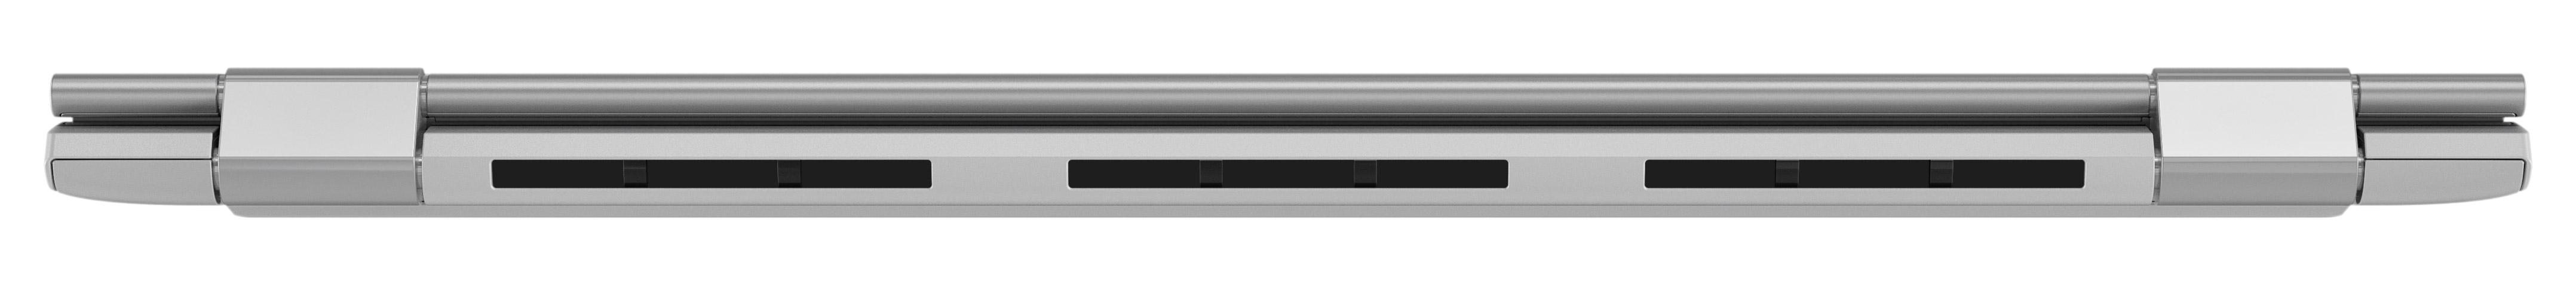 Фото  Ультрабук Lenovo Yoga 530 Mineral Grey (81EK00KHRA)